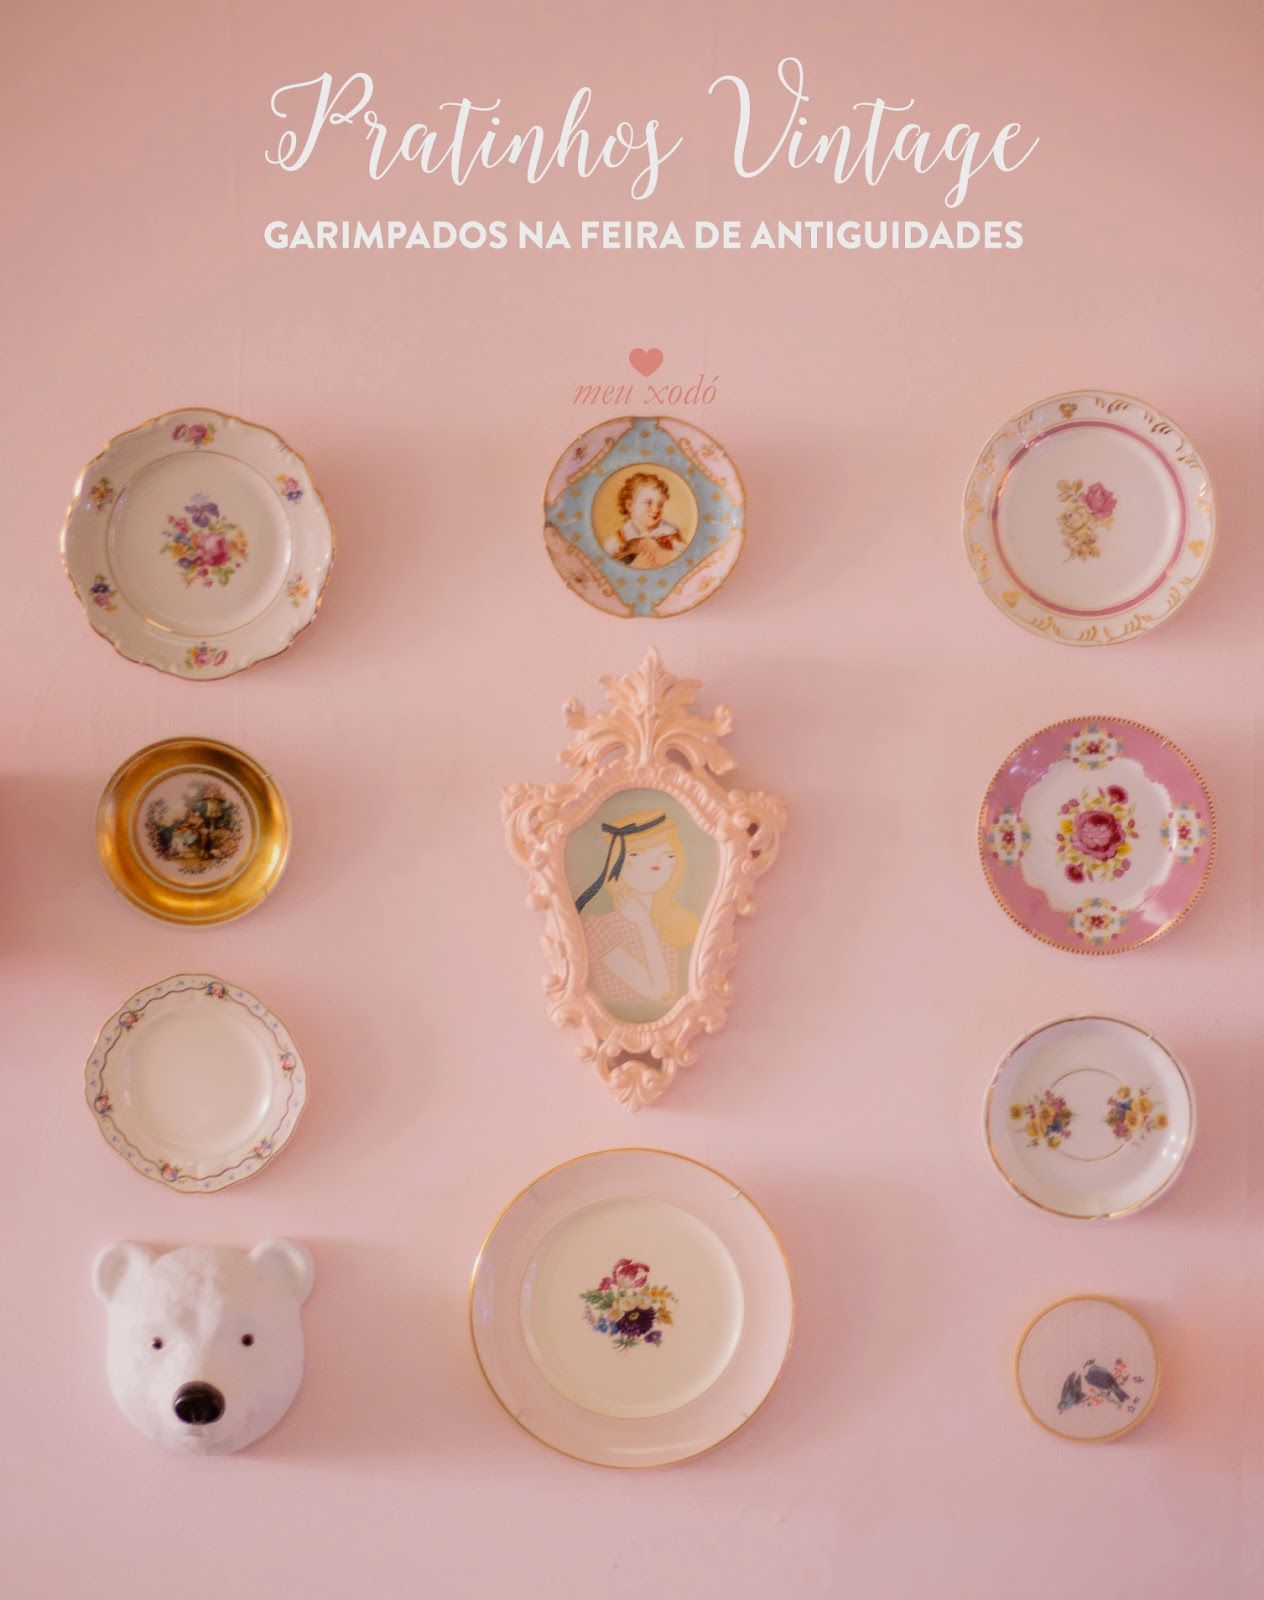 blog brasilia matheus fernandes max rocha